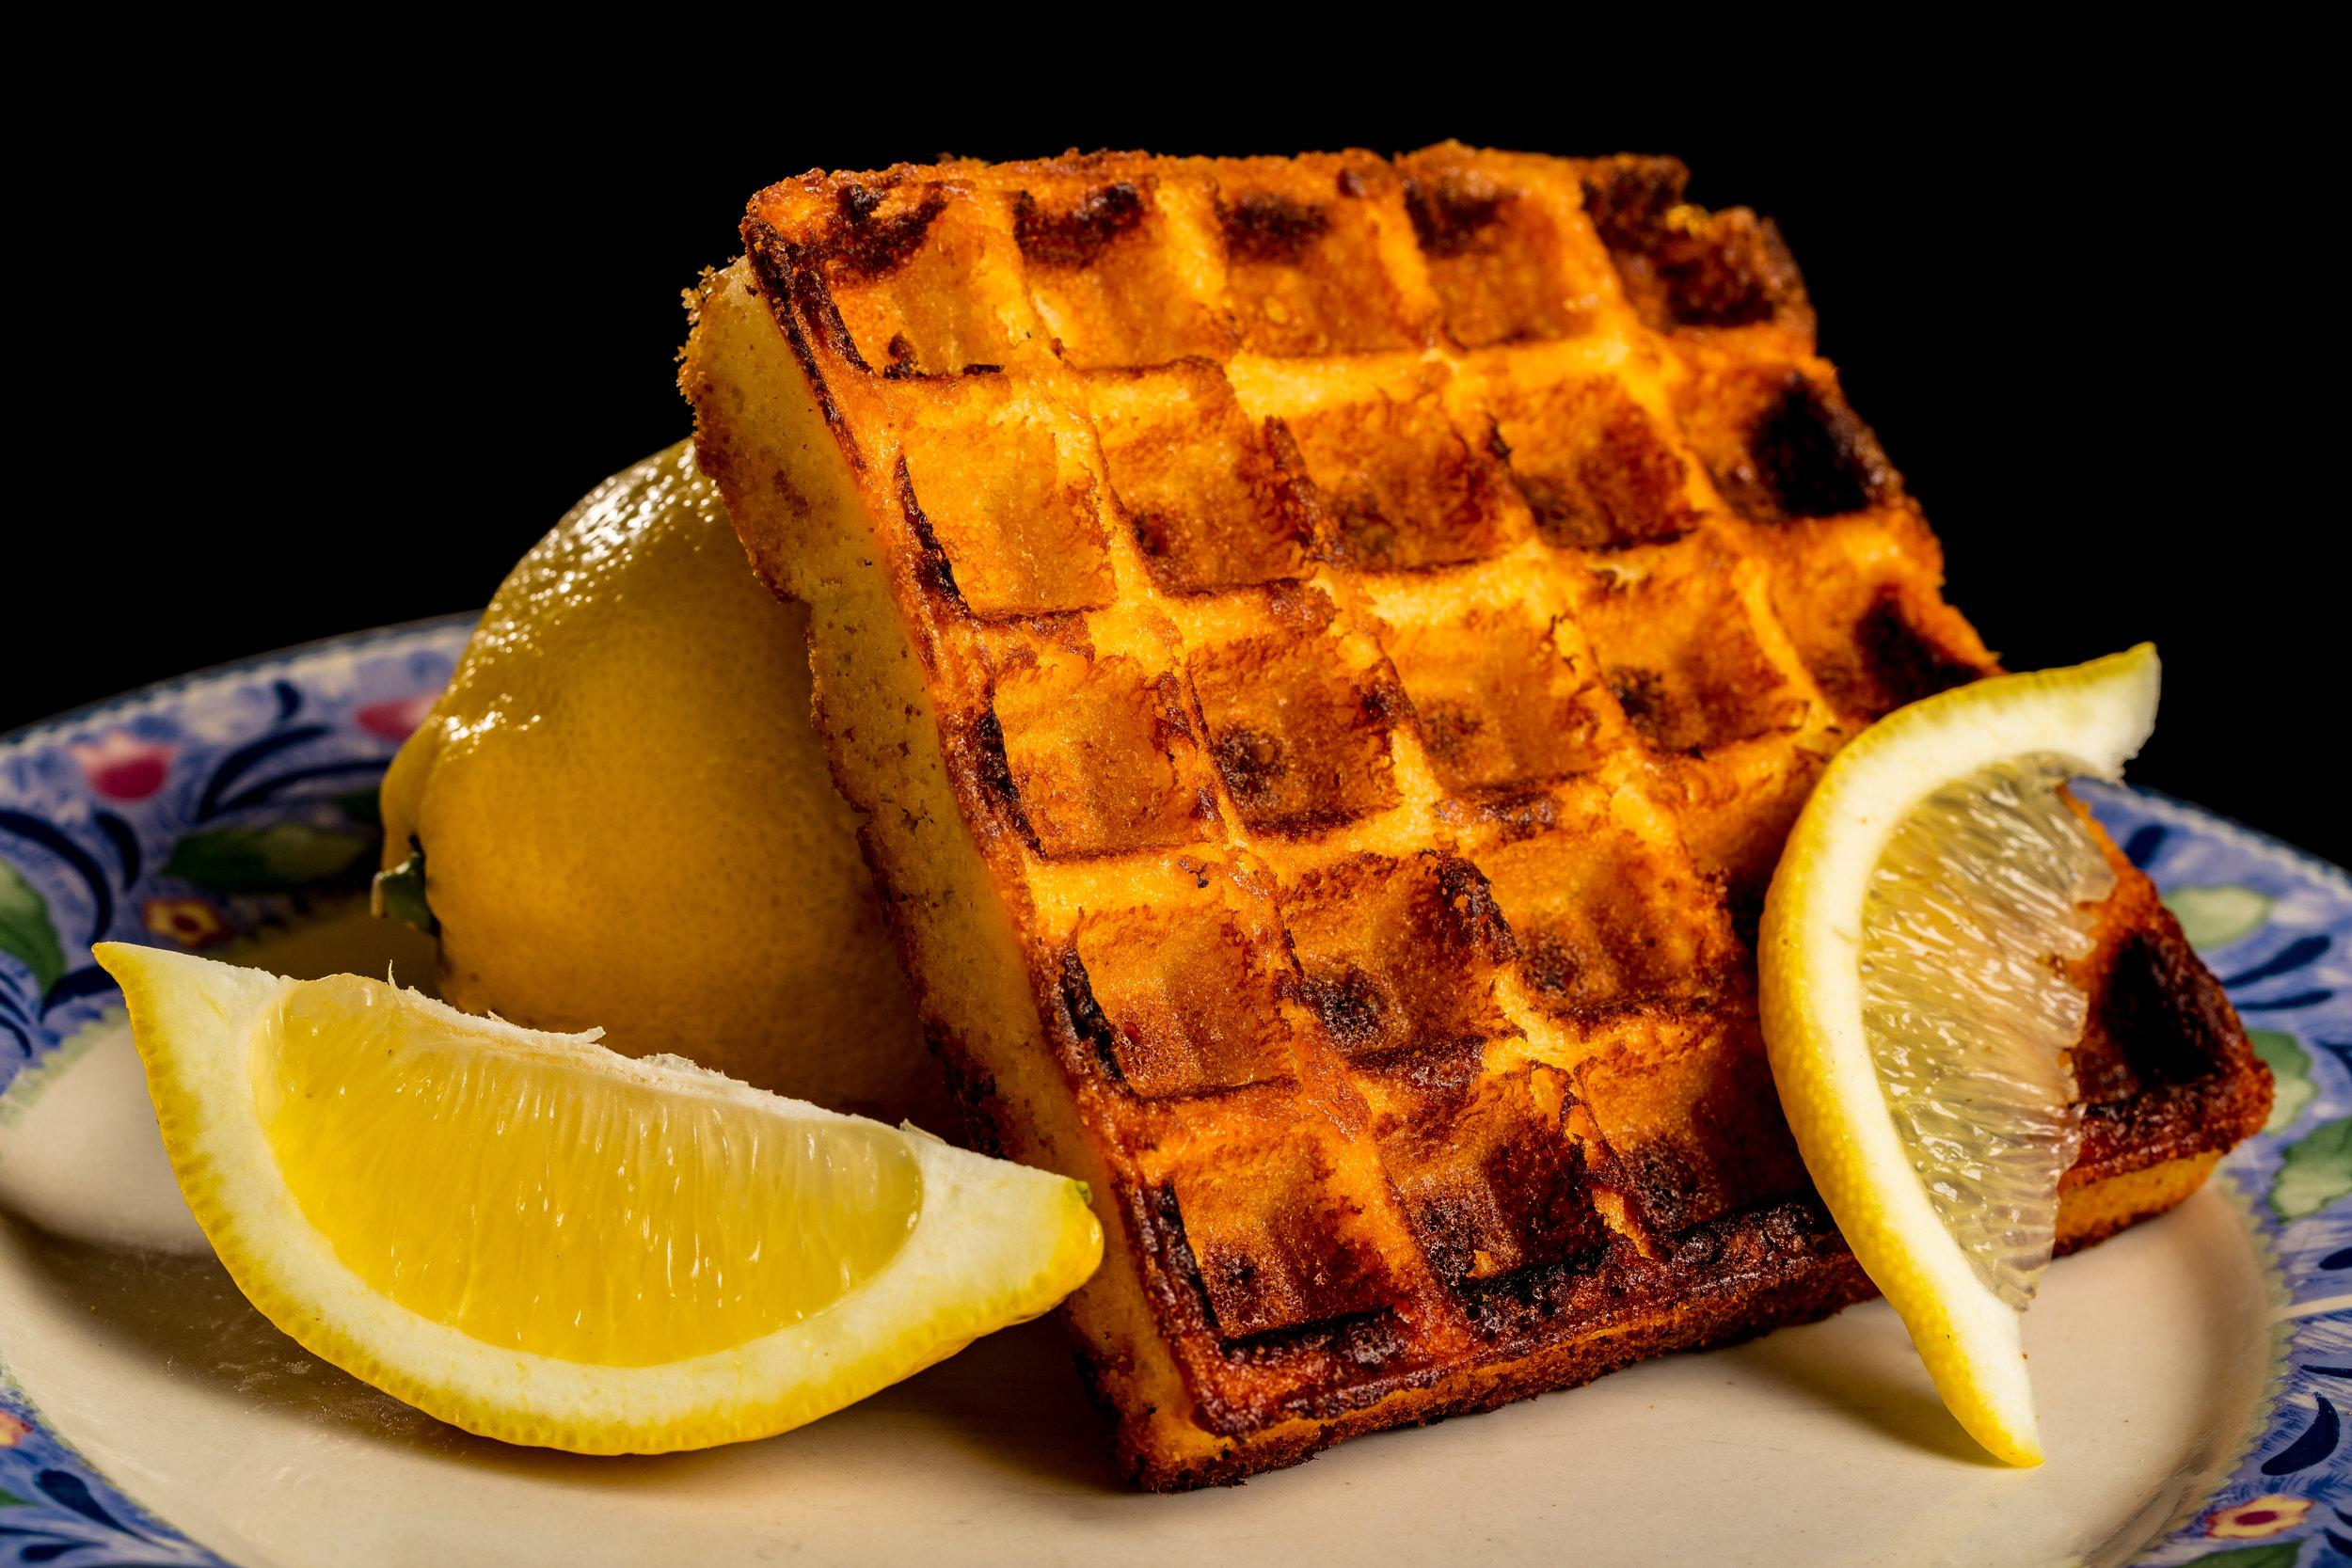 Lemon Cake Waffle - My personal favorite. Sweet, citrusy, and fresh!